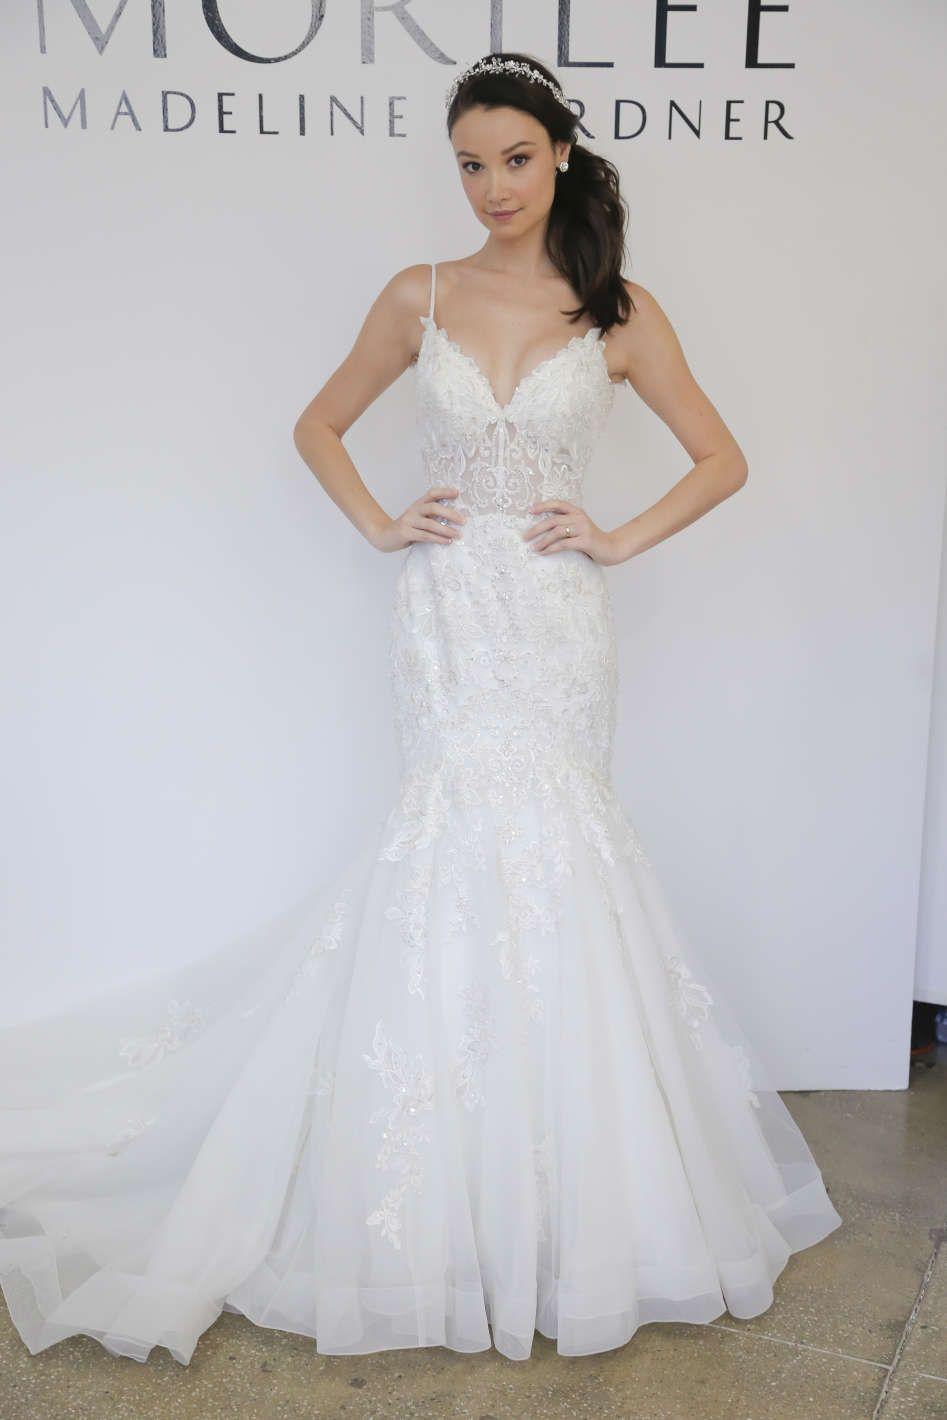 77+ Wedding Dress Las Vegas - Best Shapewear for Wedding Dress Check ...